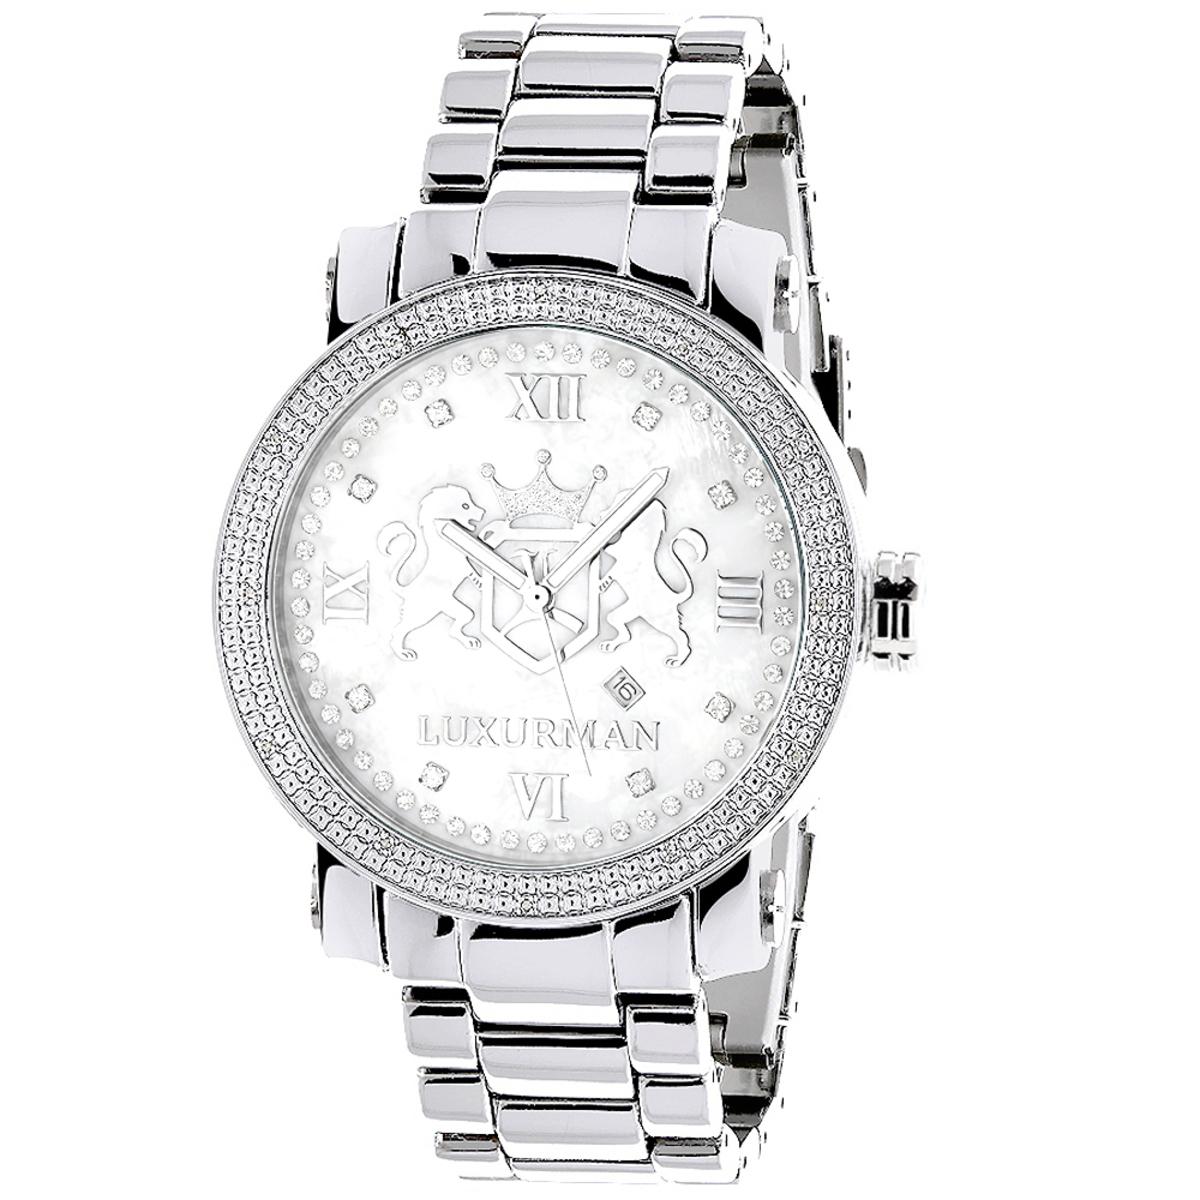 Large Diamond Watches For Men 0.12ct Luxurman Phantom White MOP